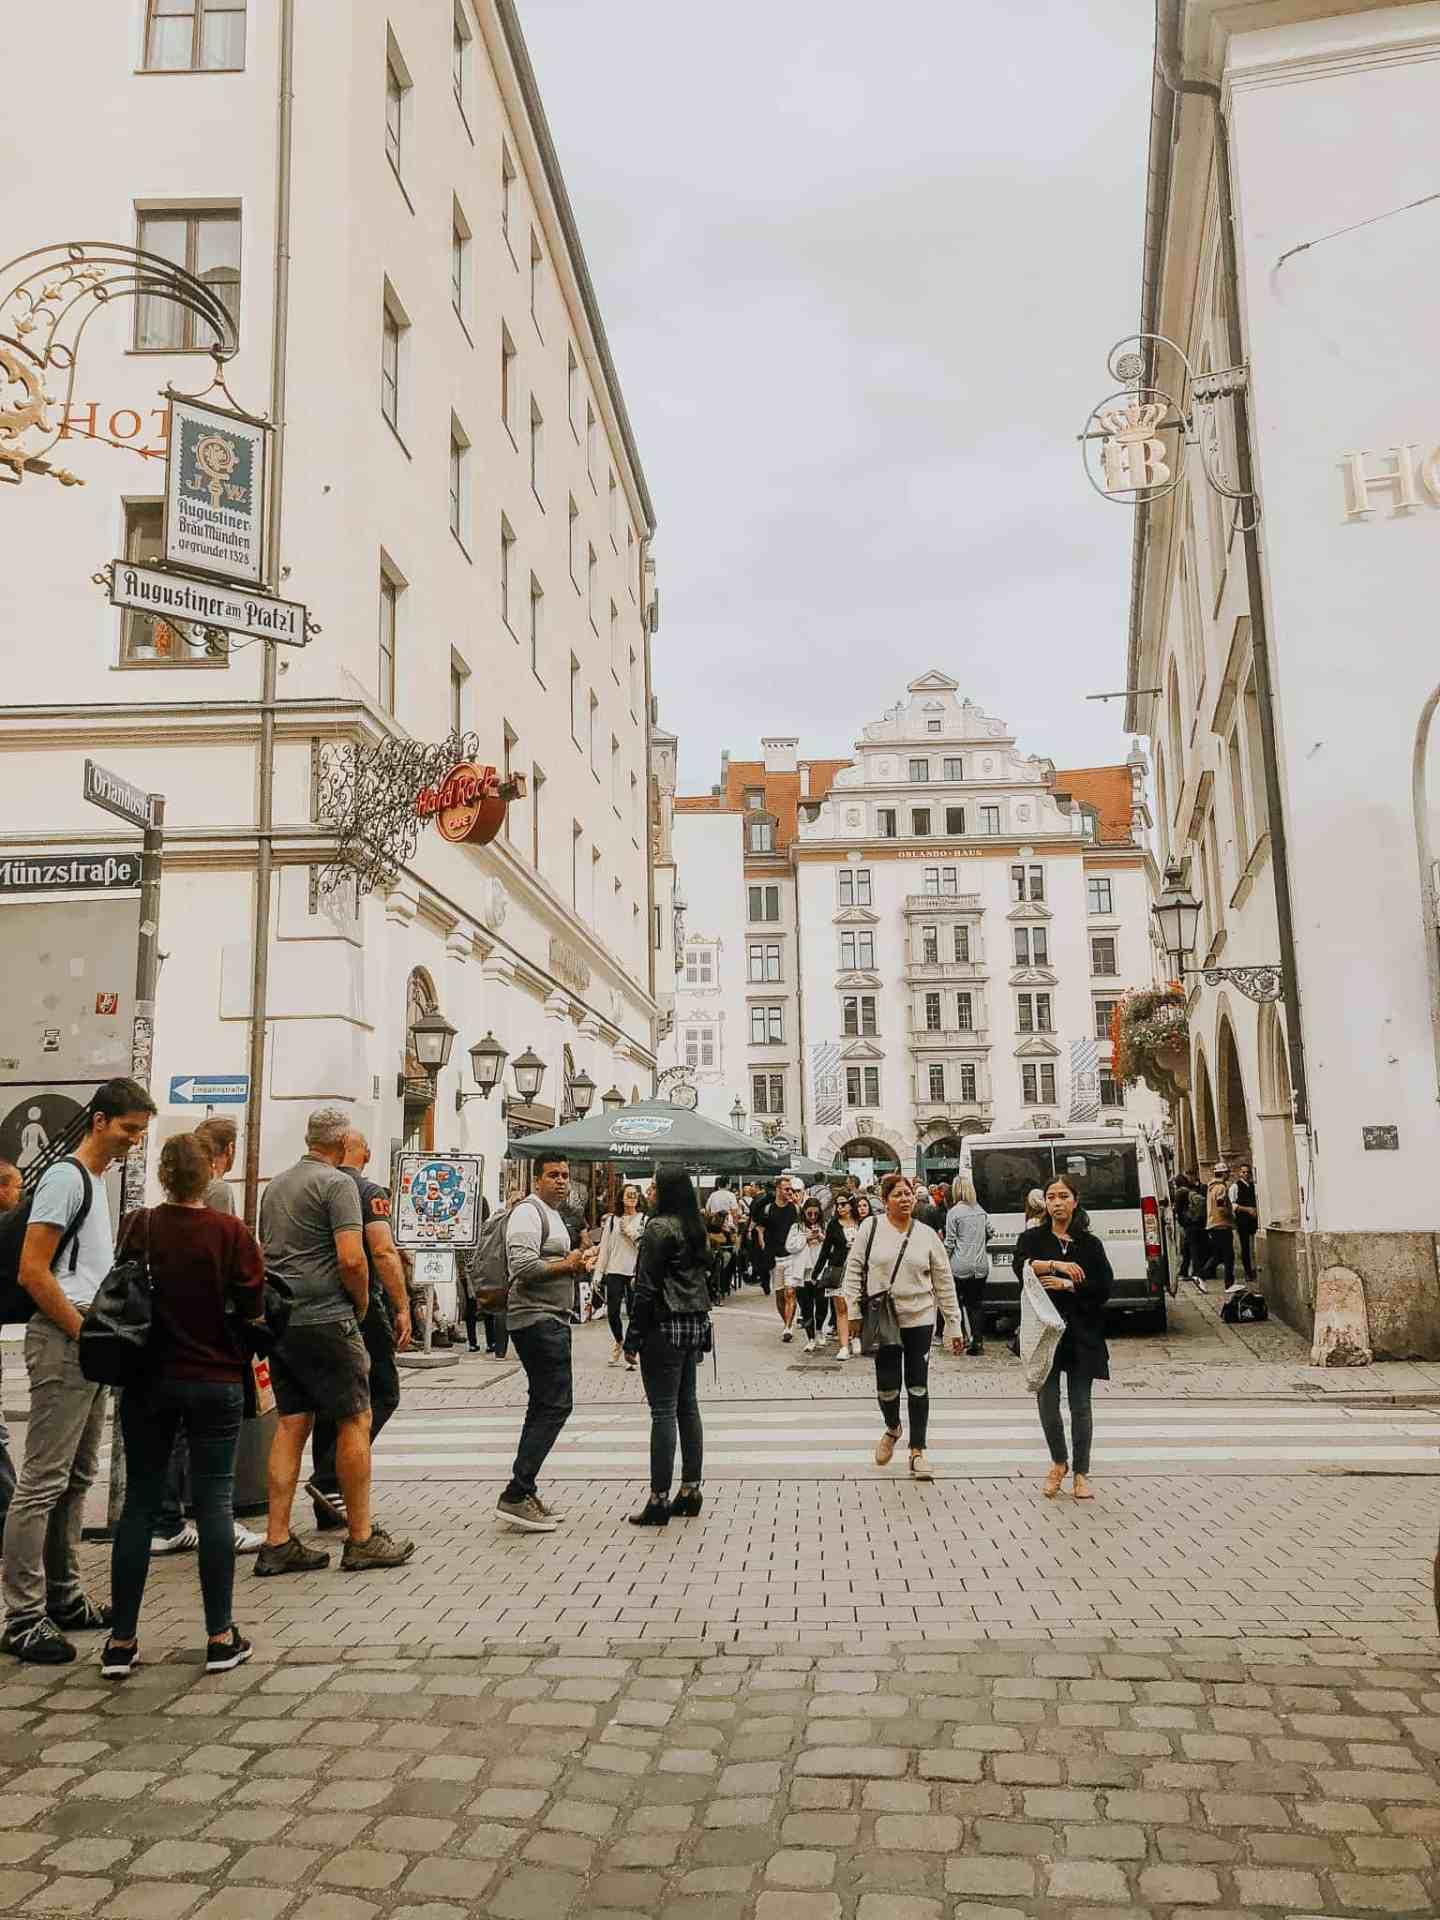 Free walking tour in Munich